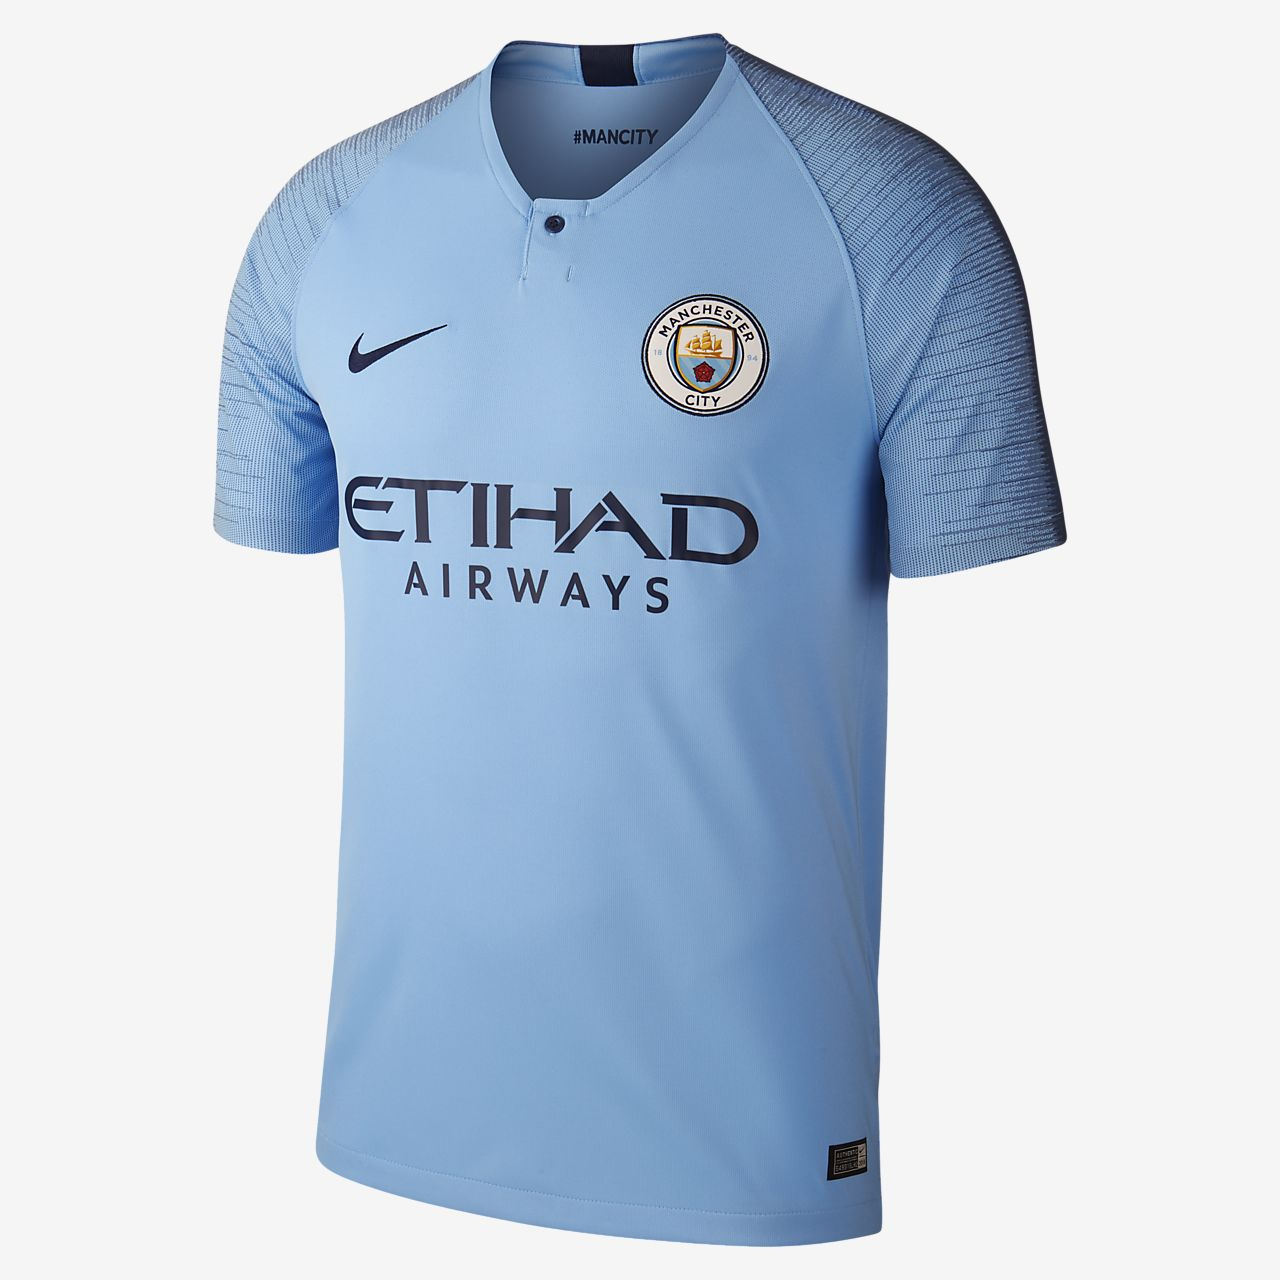 5595ca6b6a5 2018/19 Manchester City FC Stadium Home Men's Football Shirt. Nike ...